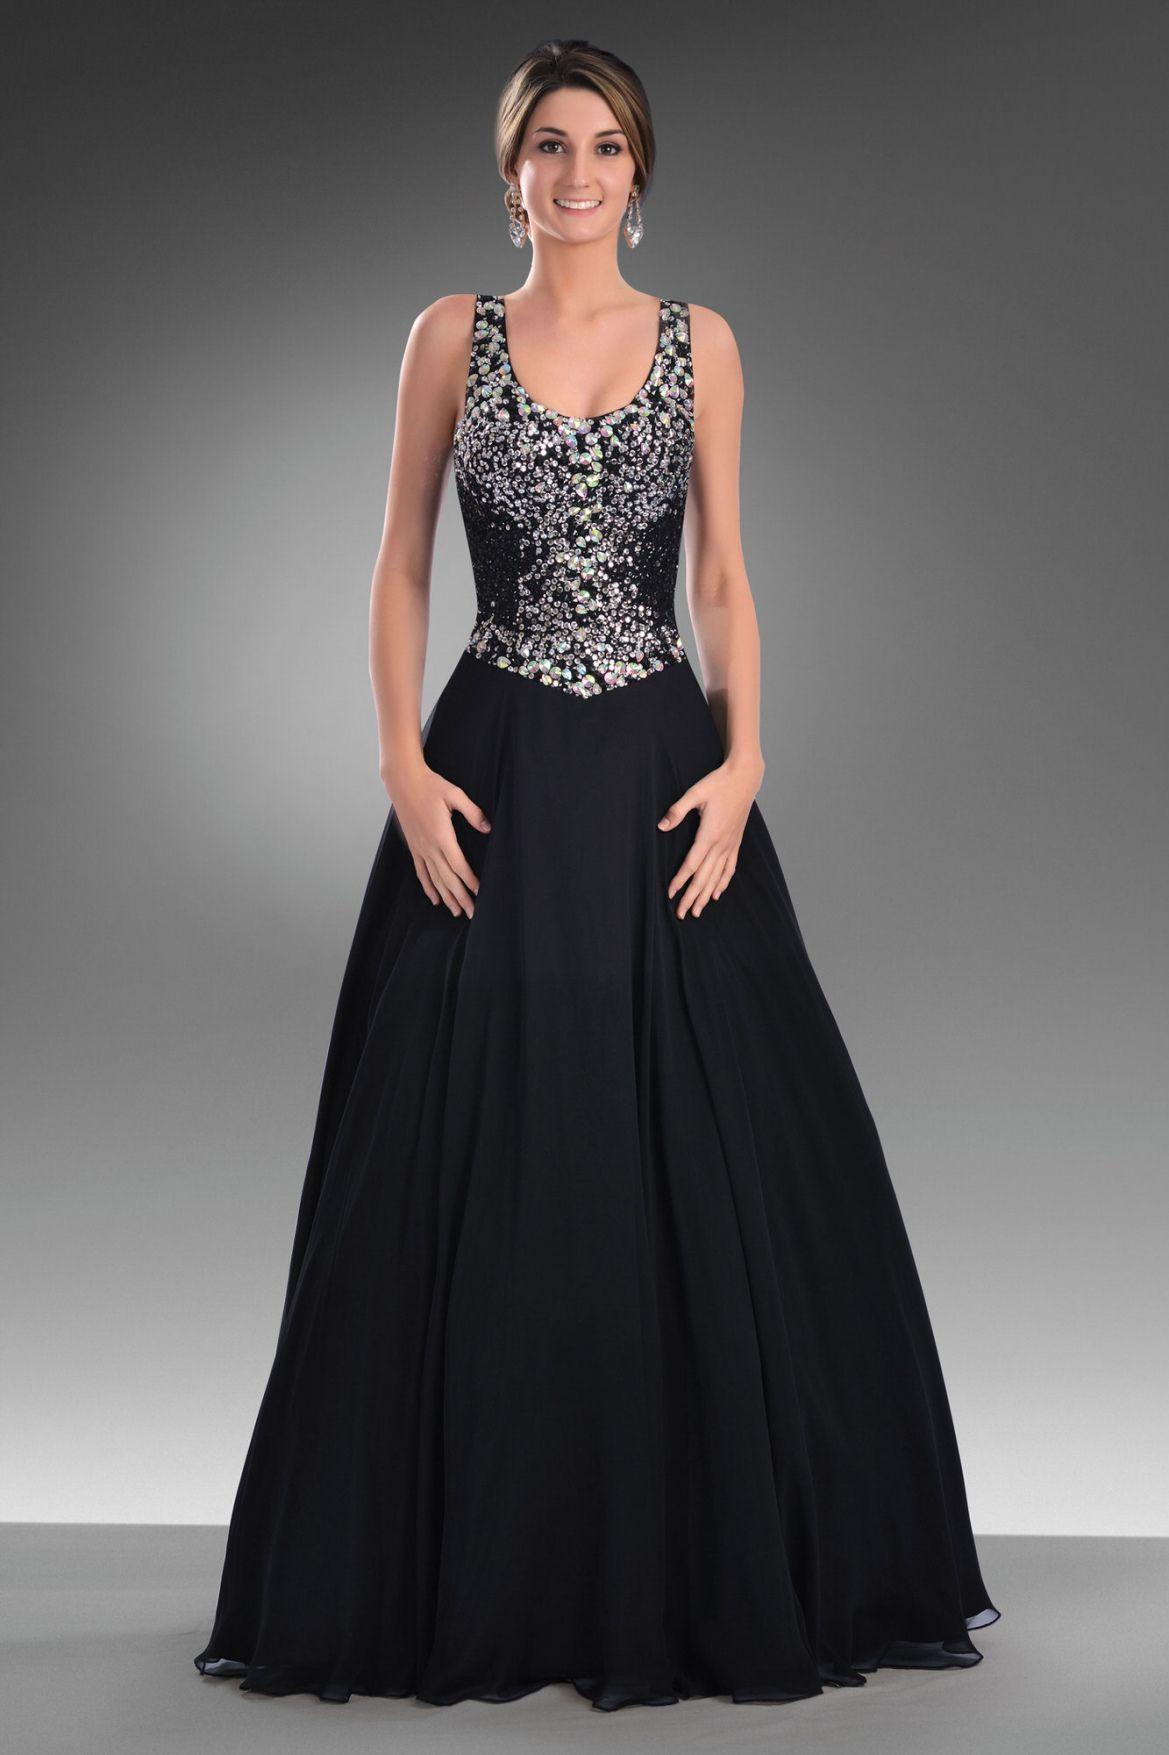 99 Wedding Dresses Burlington Vt For Reception Check More At Http